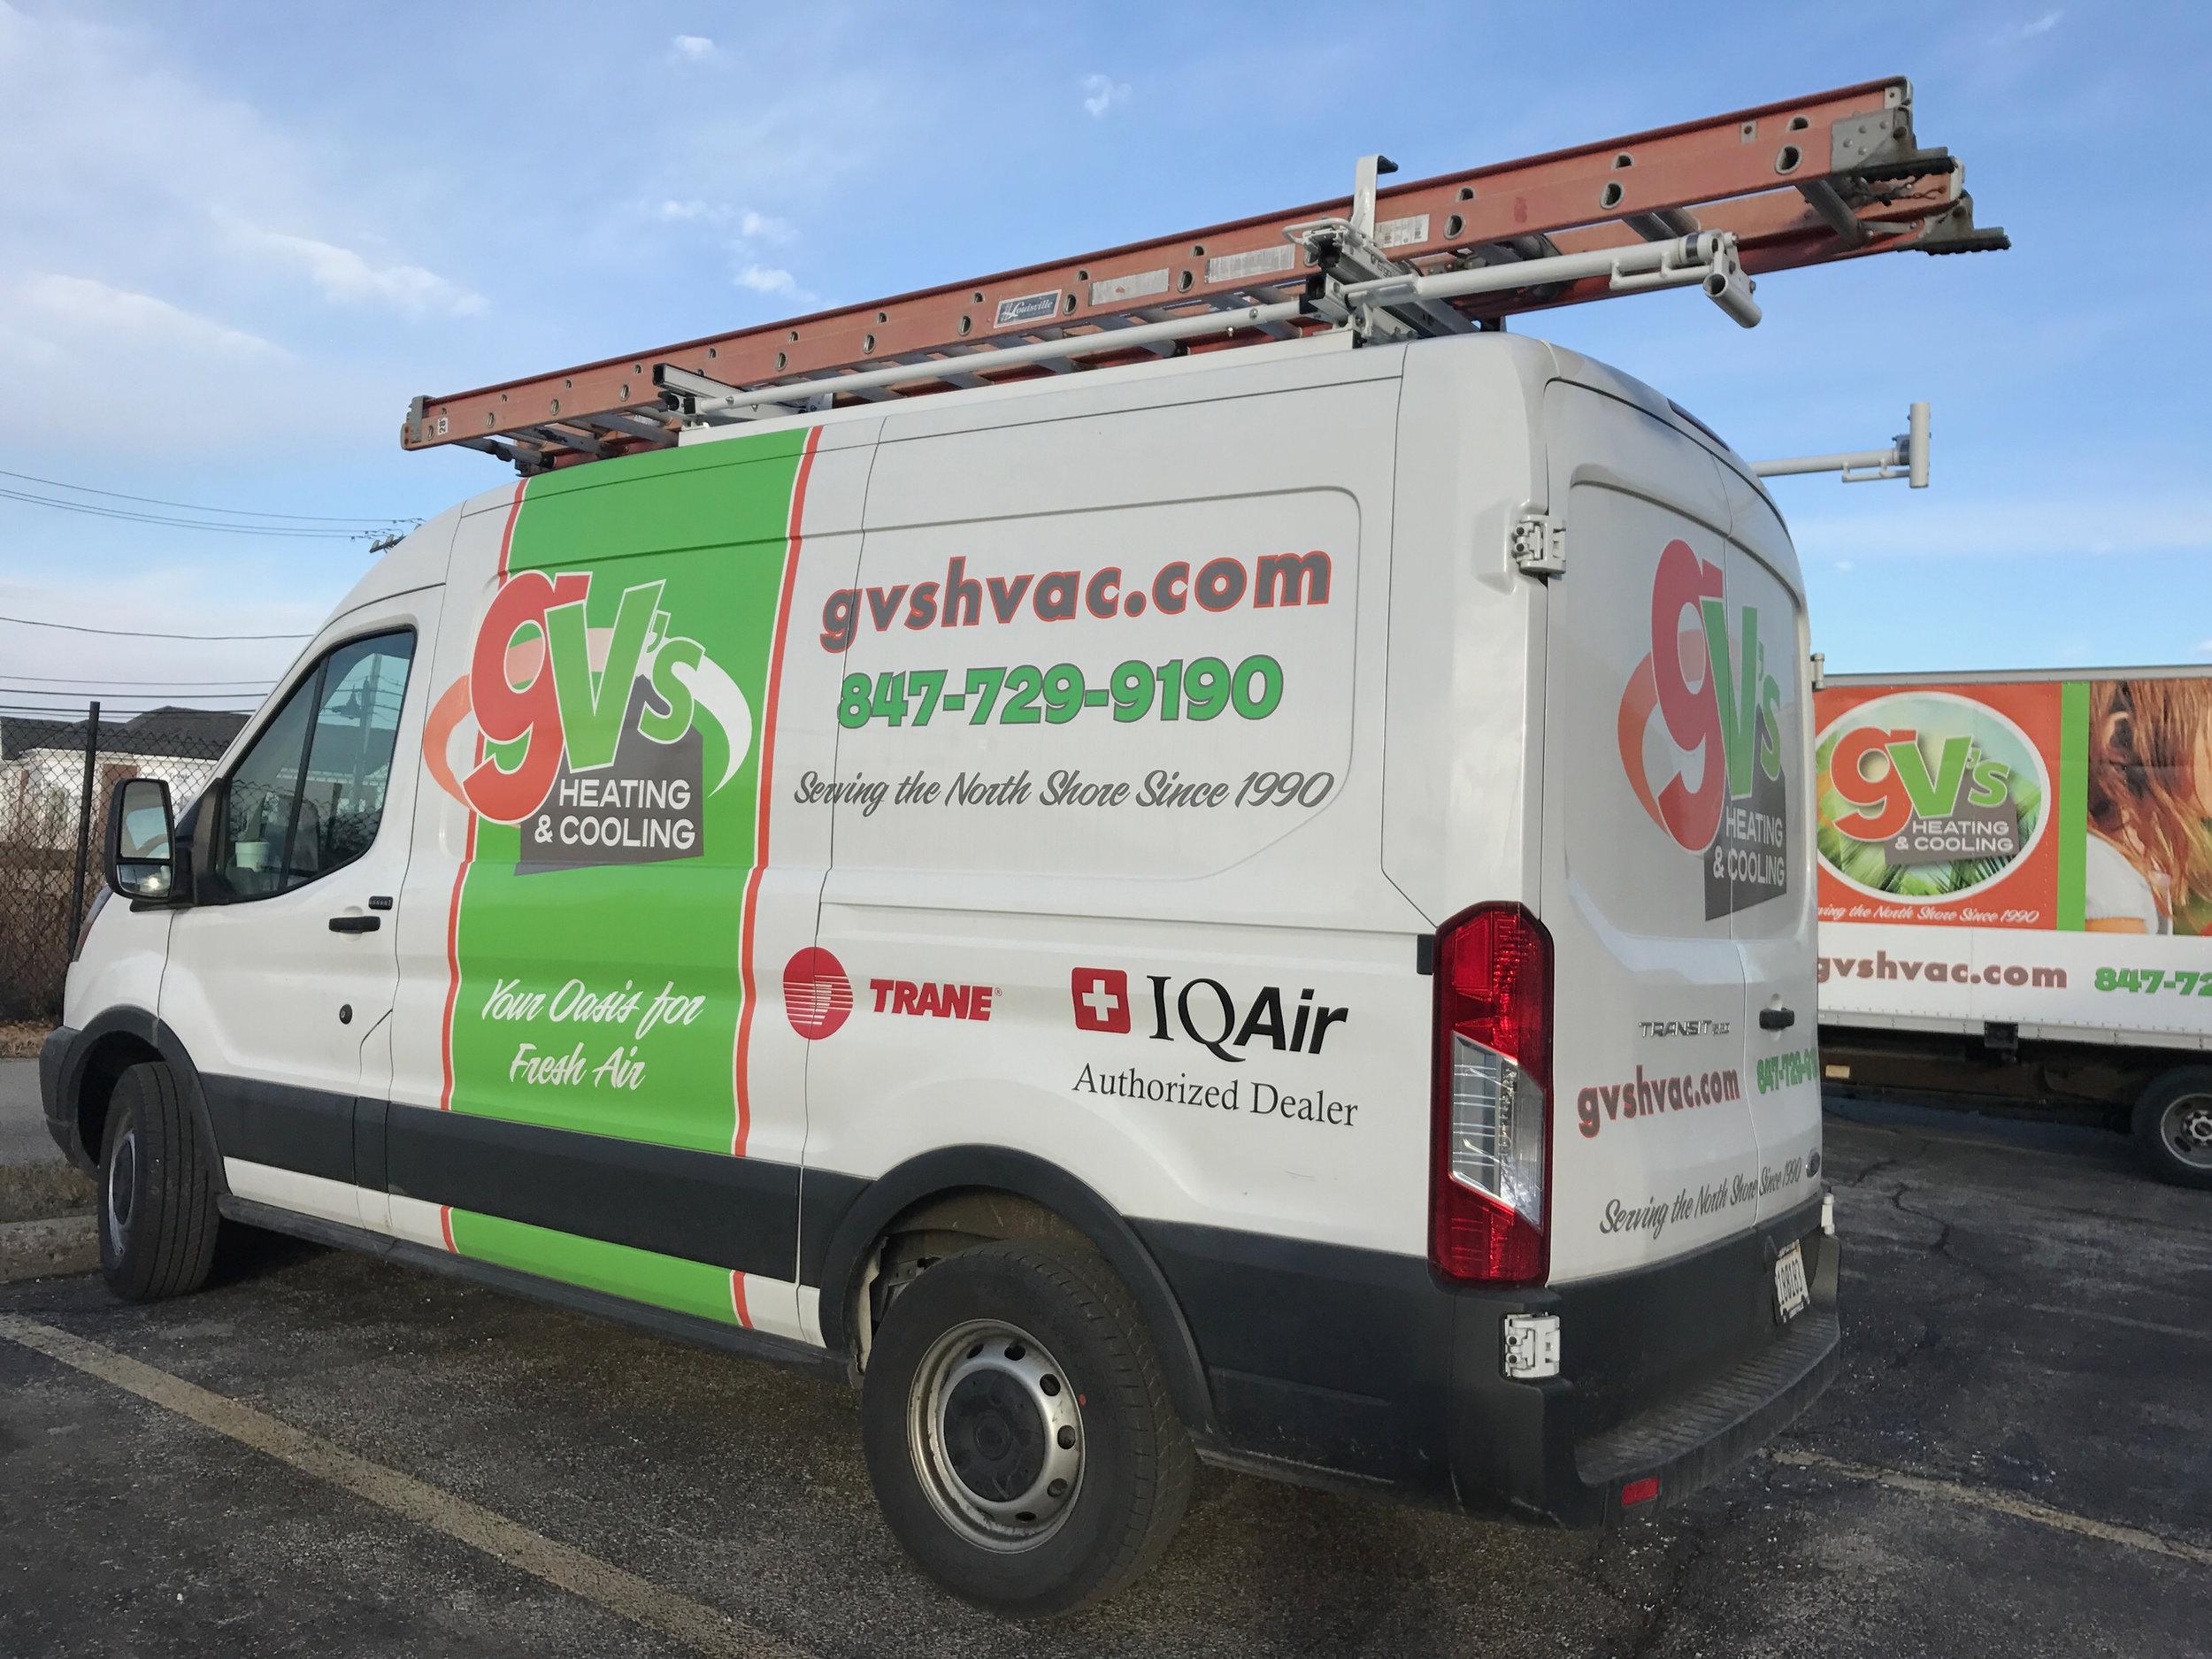 gvs-hvac-installation-repair-maintenance-emergency-service.jpg